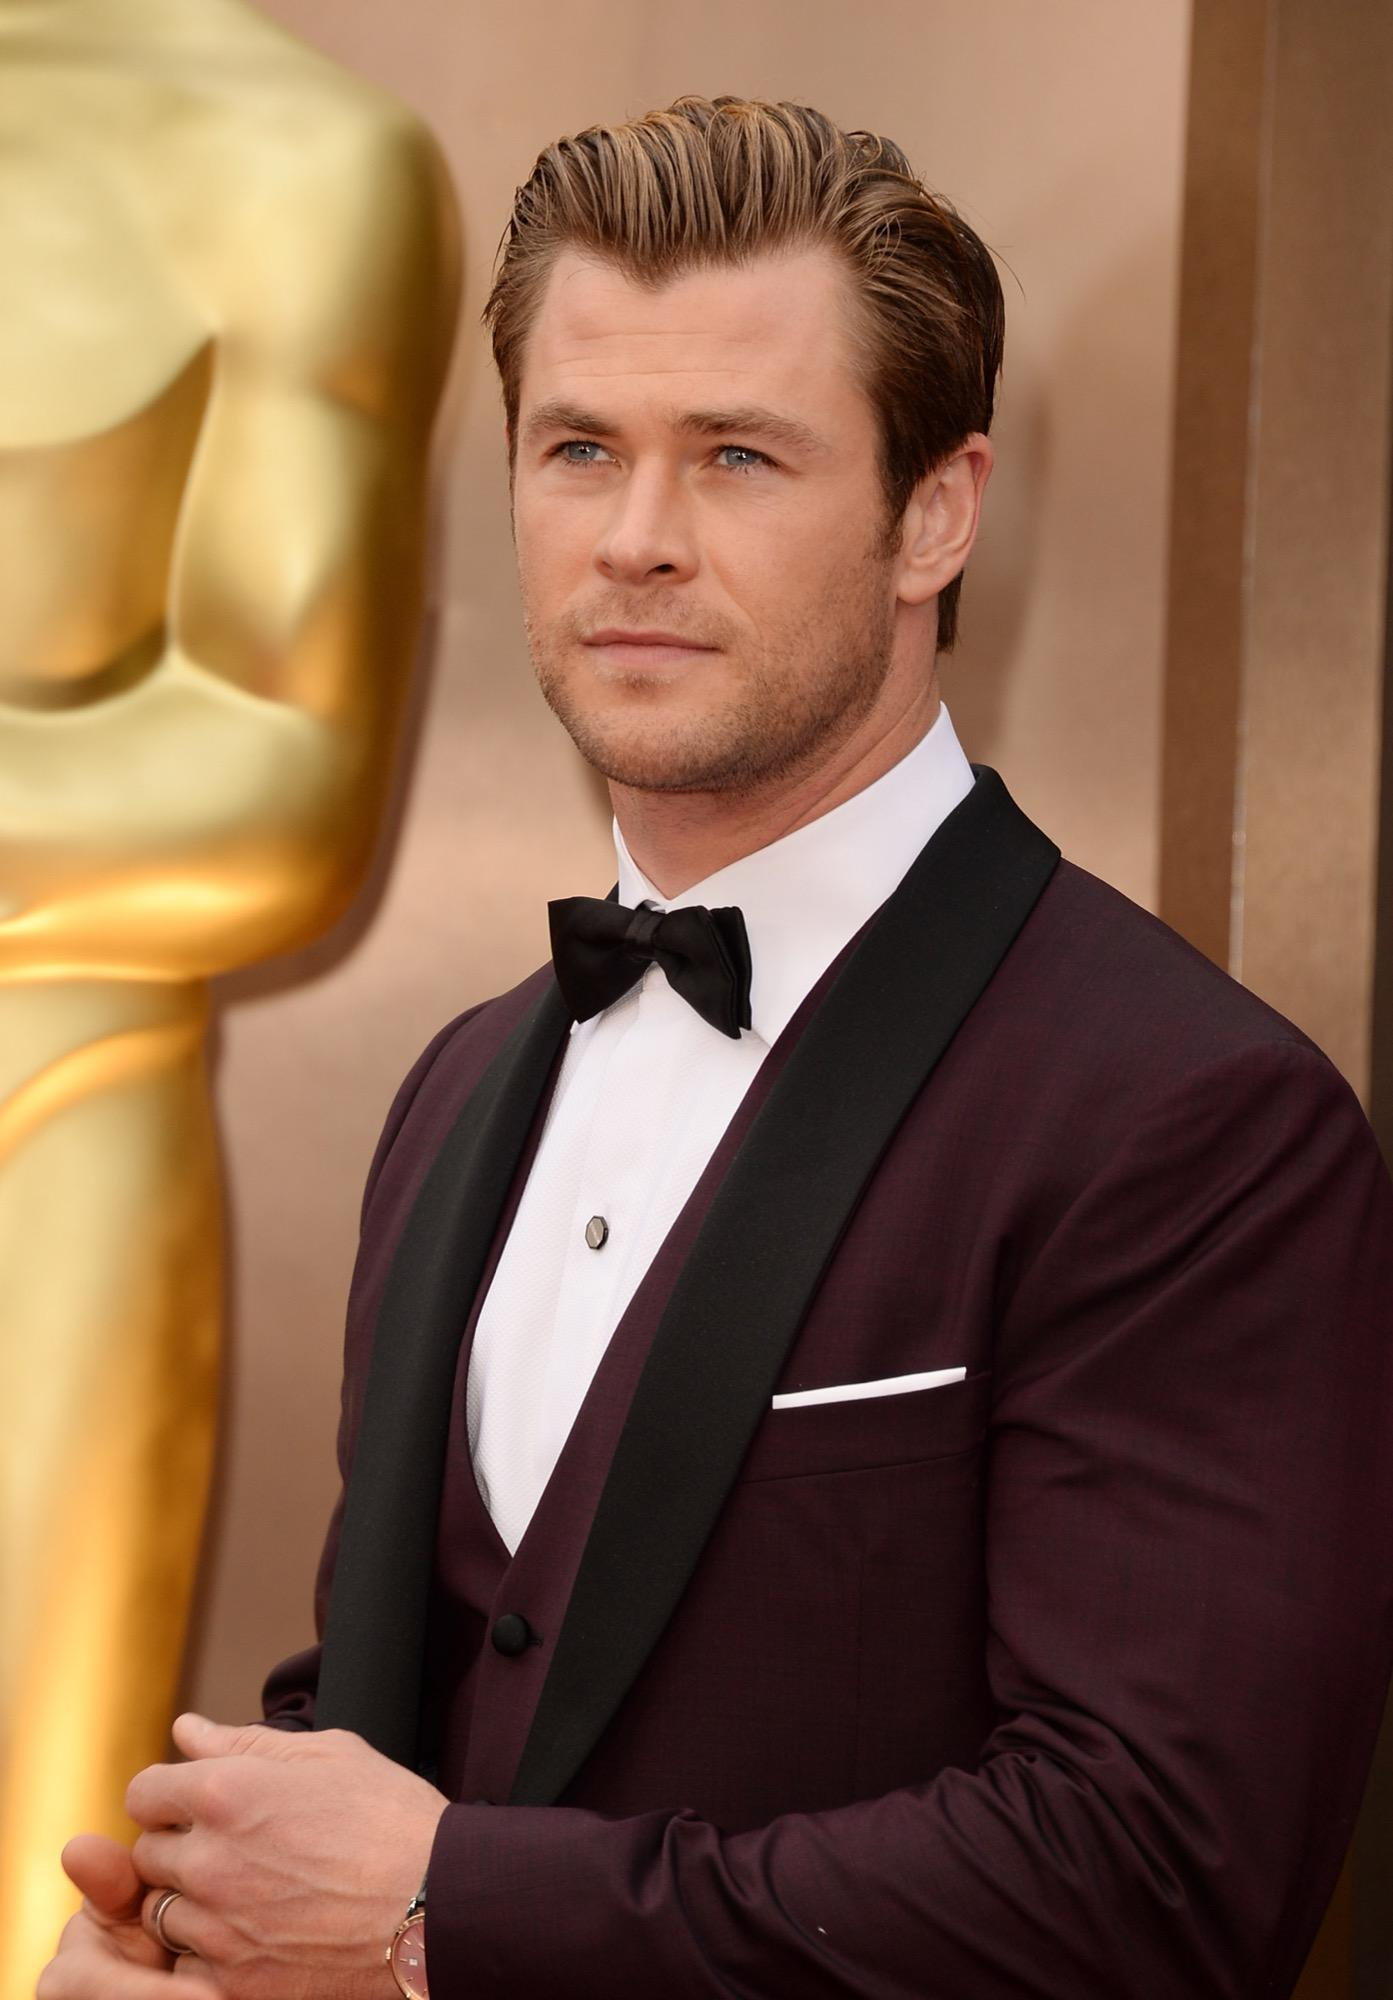 Sexiest Man Alive 2014 - Chris Hemsworth